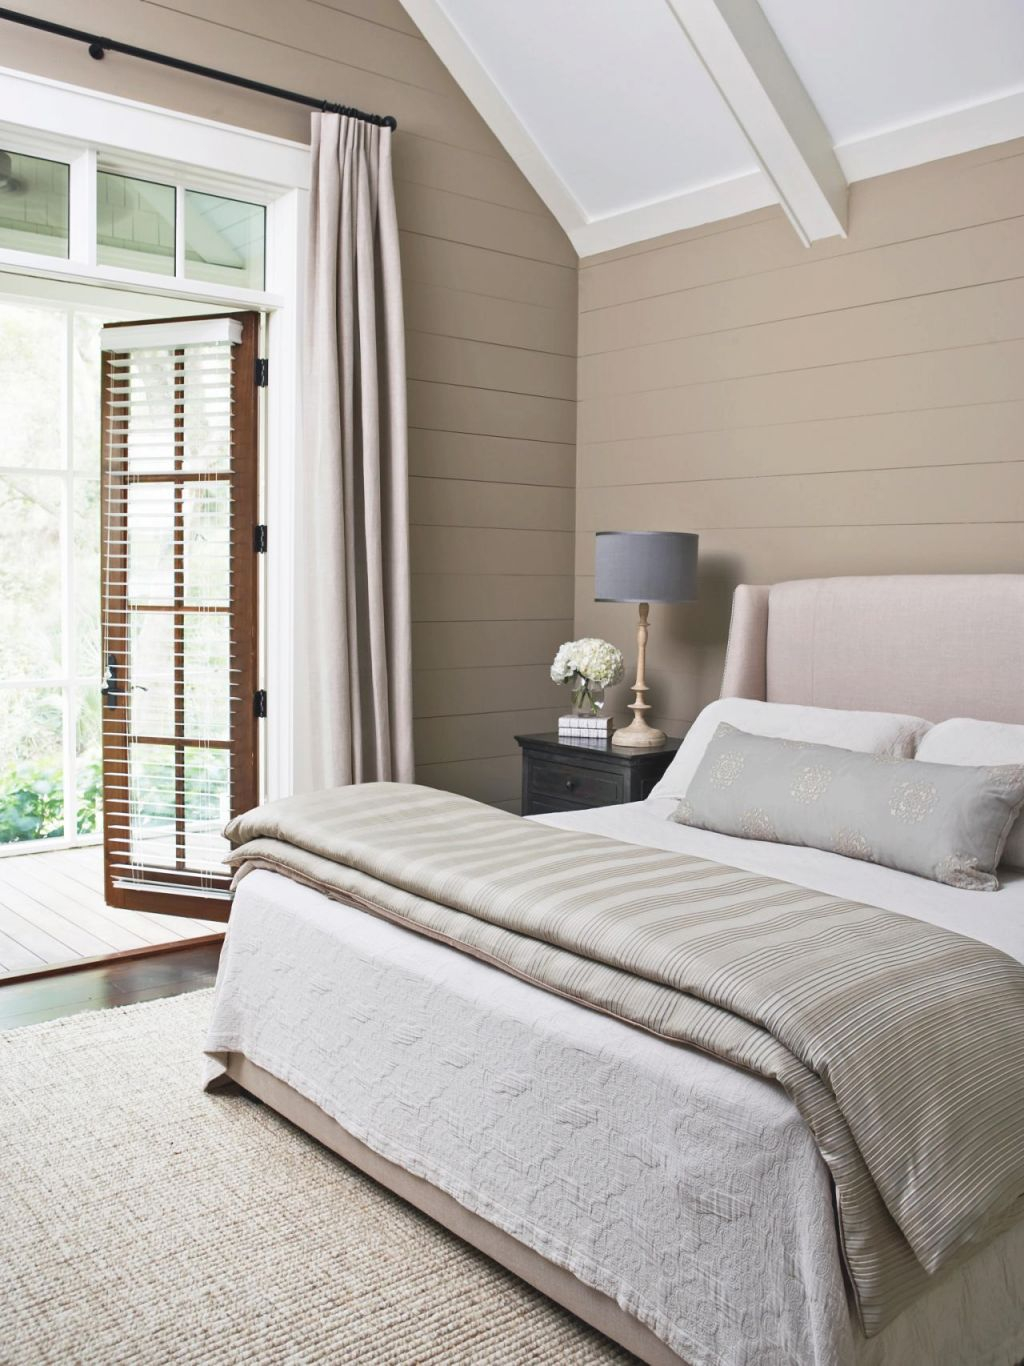 14 Ideas For Small Bedroom Decor | Hgtv's Decorating with Best of Decorating Ideas For Small Bedroom